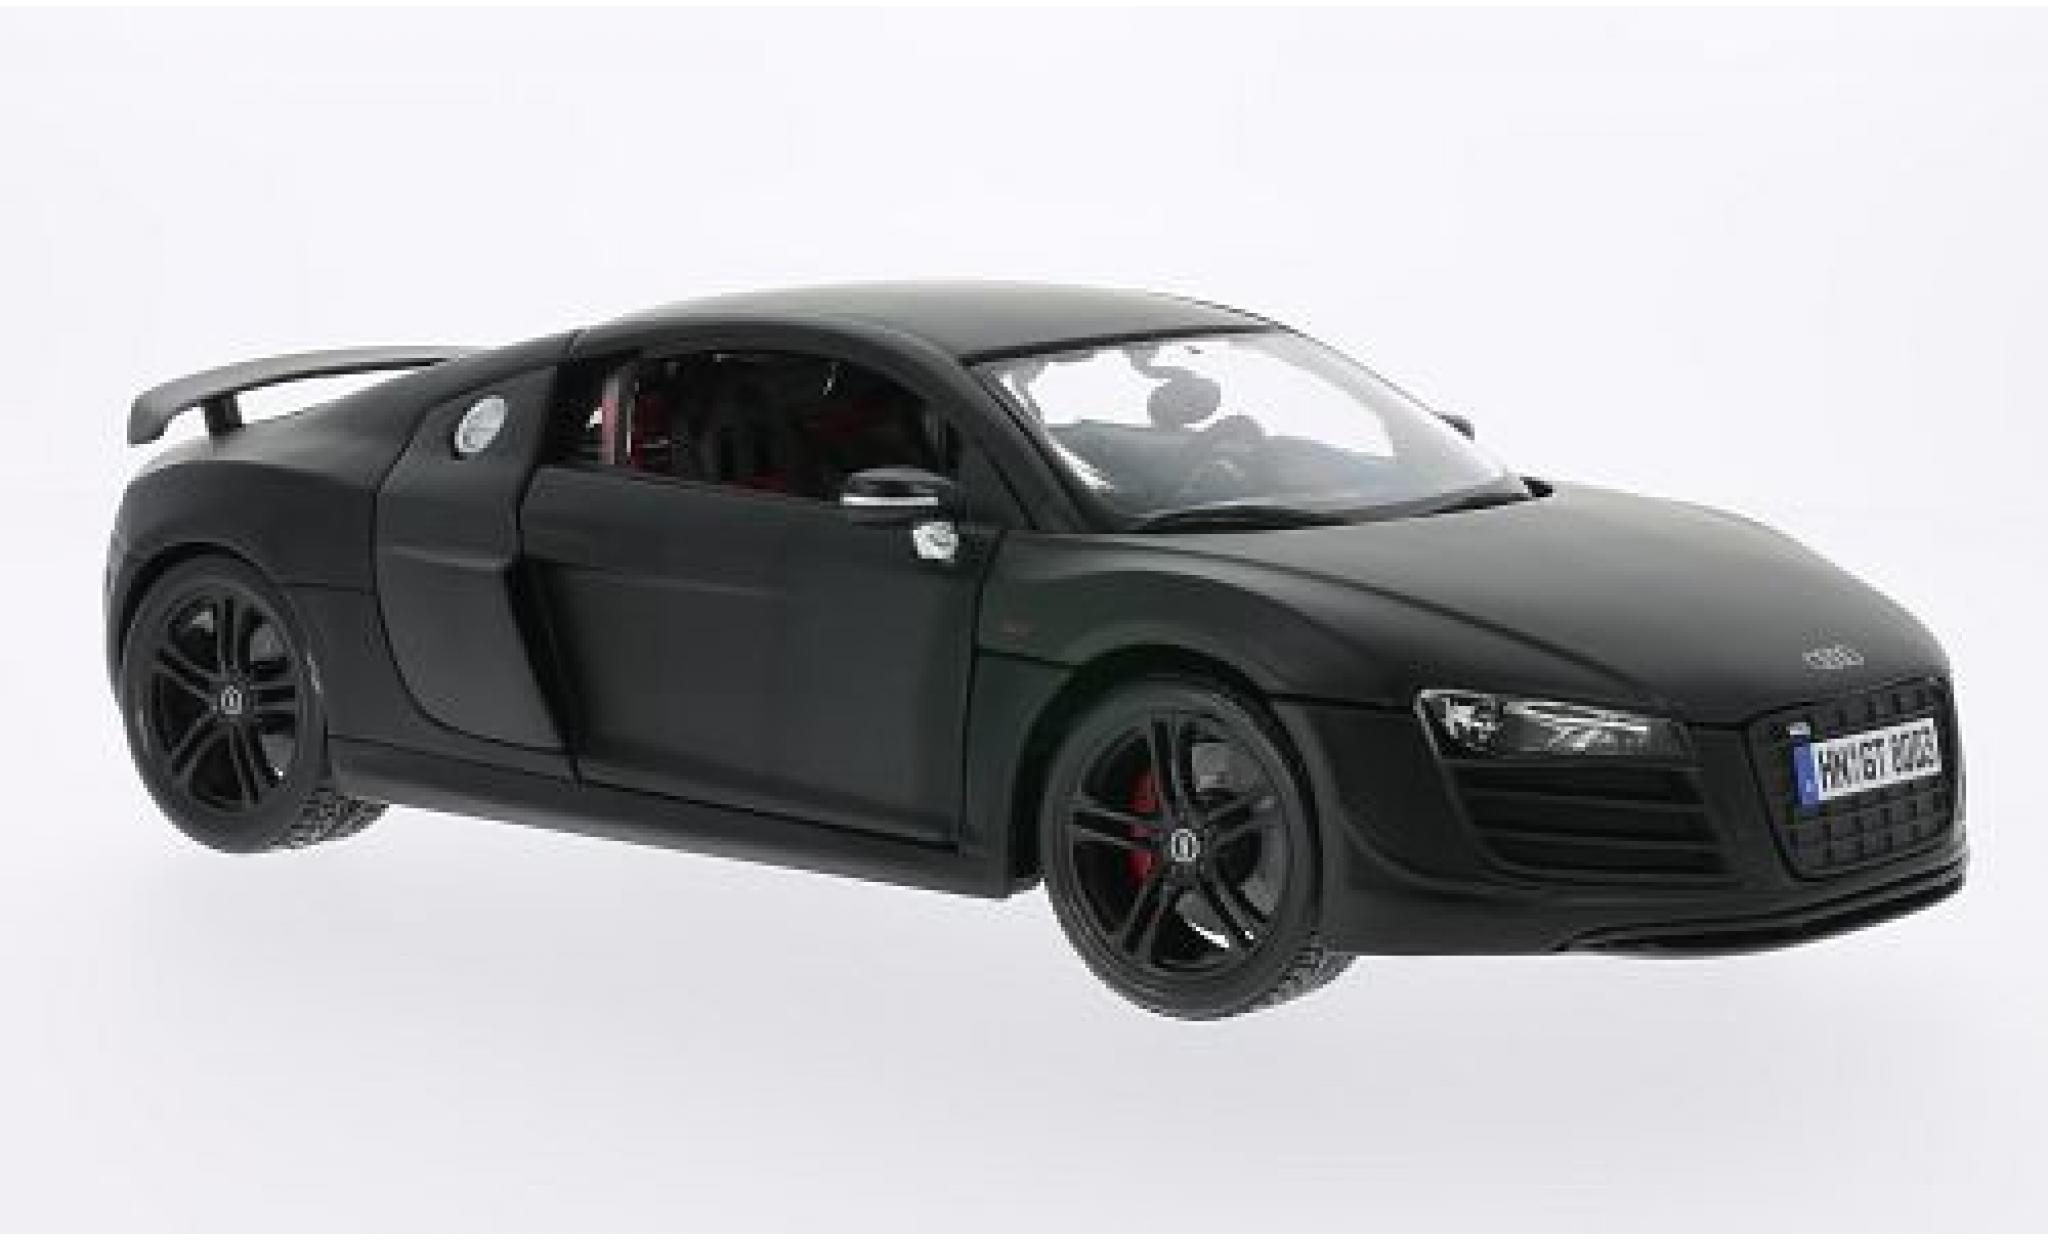 Audi R8 1/18 Maisto GT matt-black